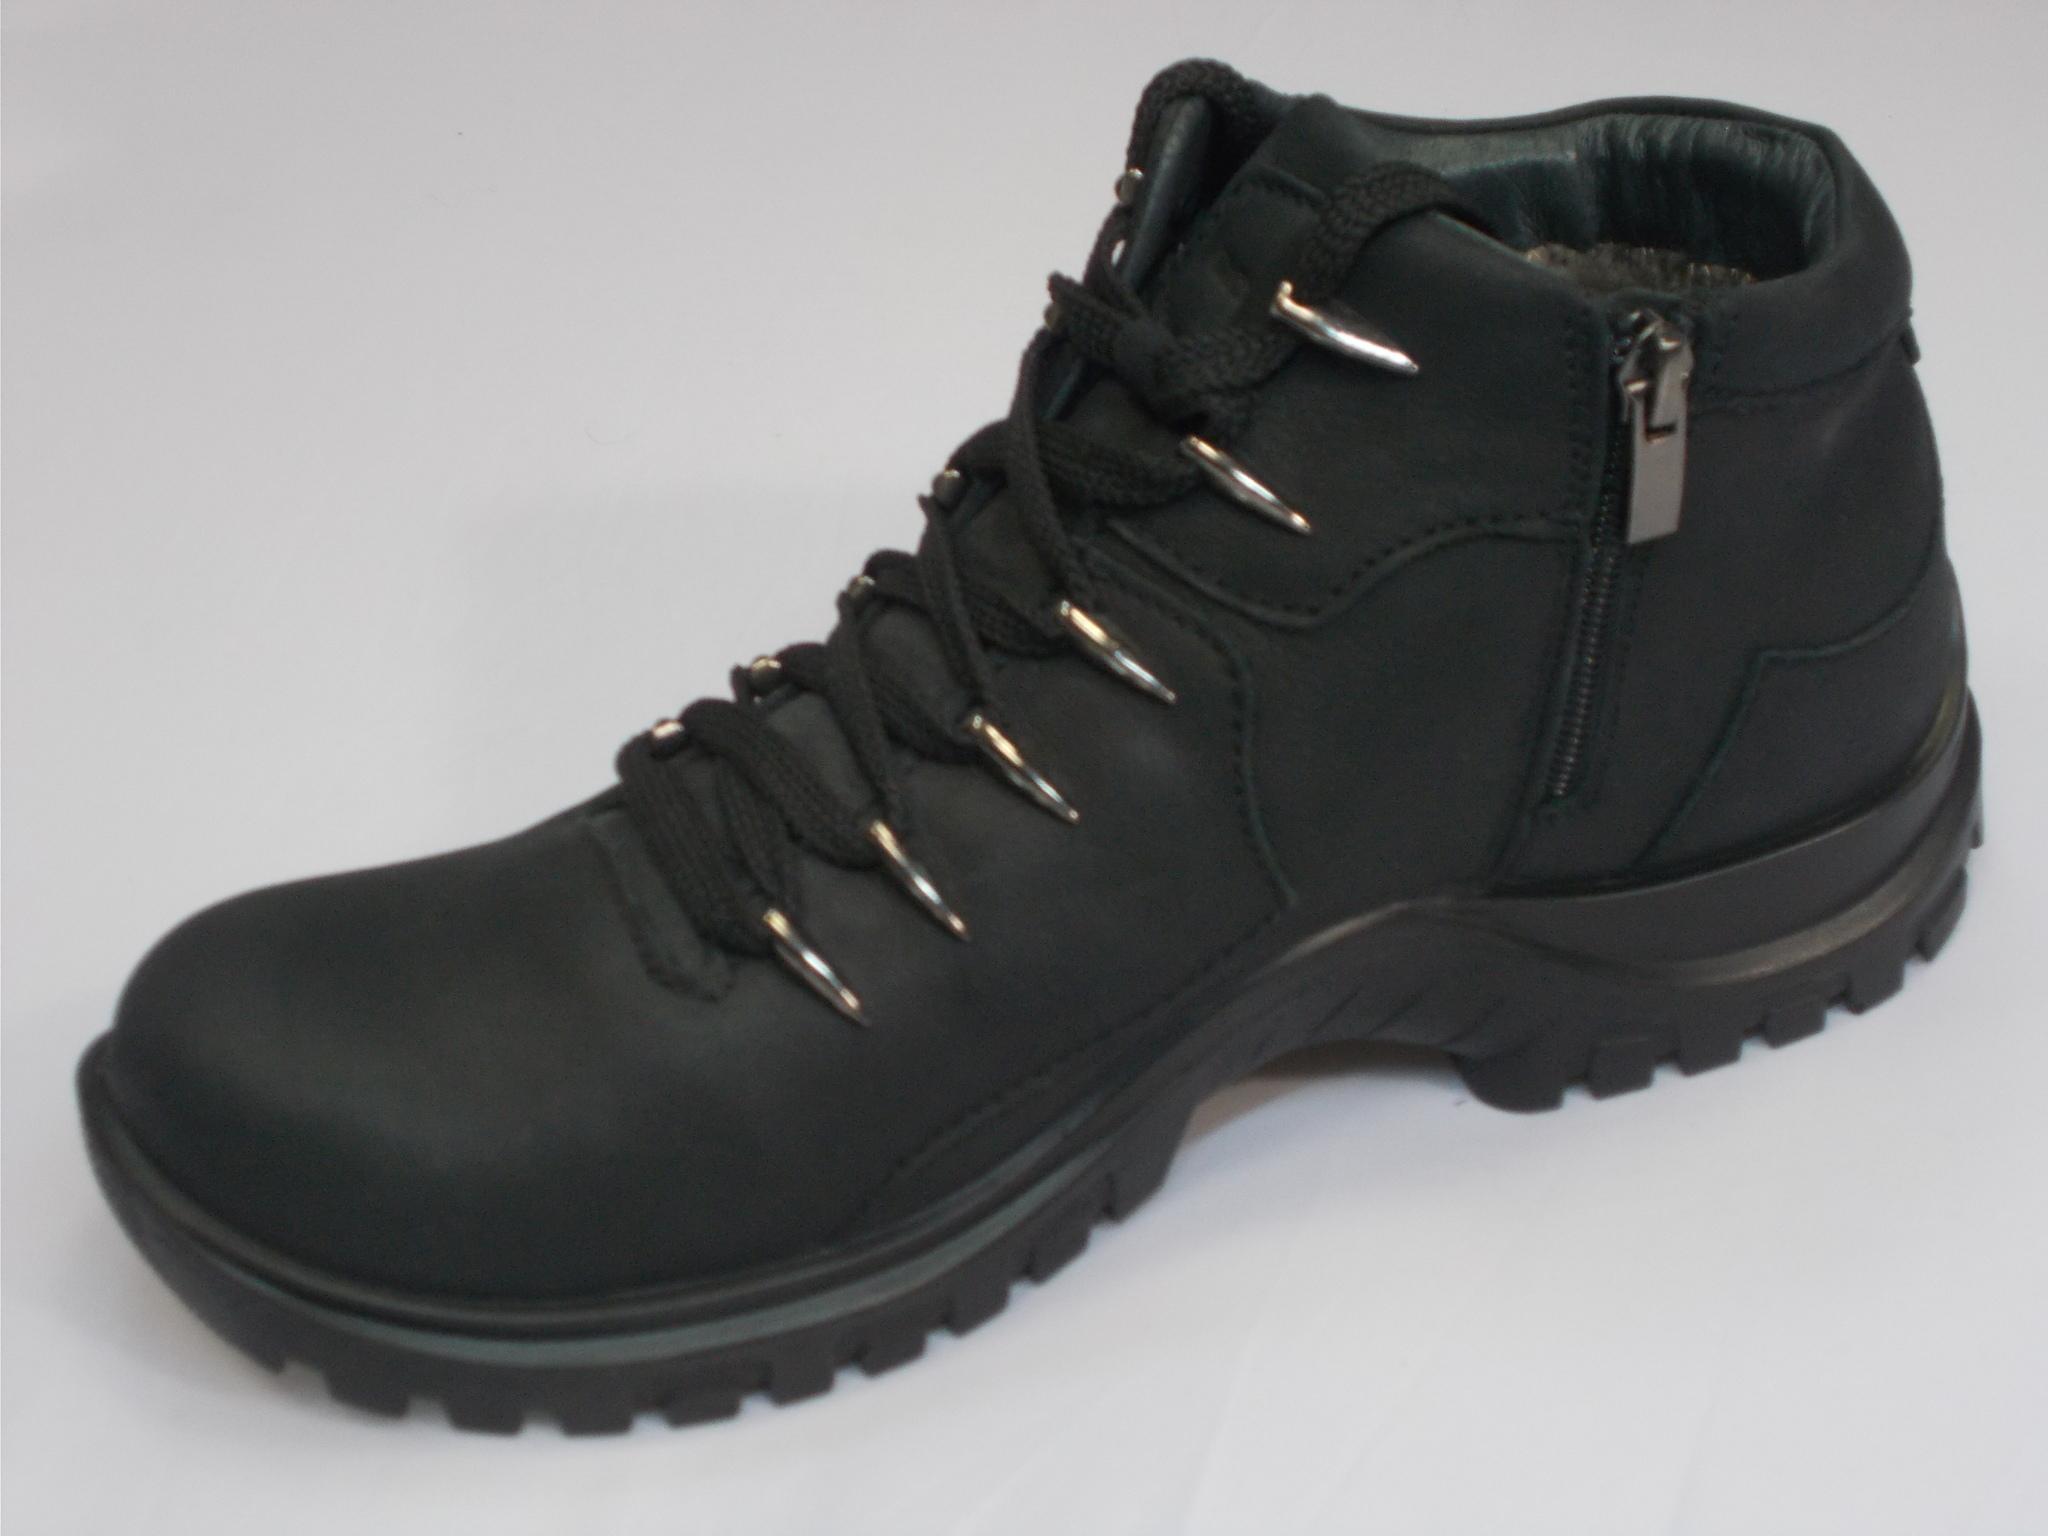 Мужские зимние ботинки Romika (Ромика)